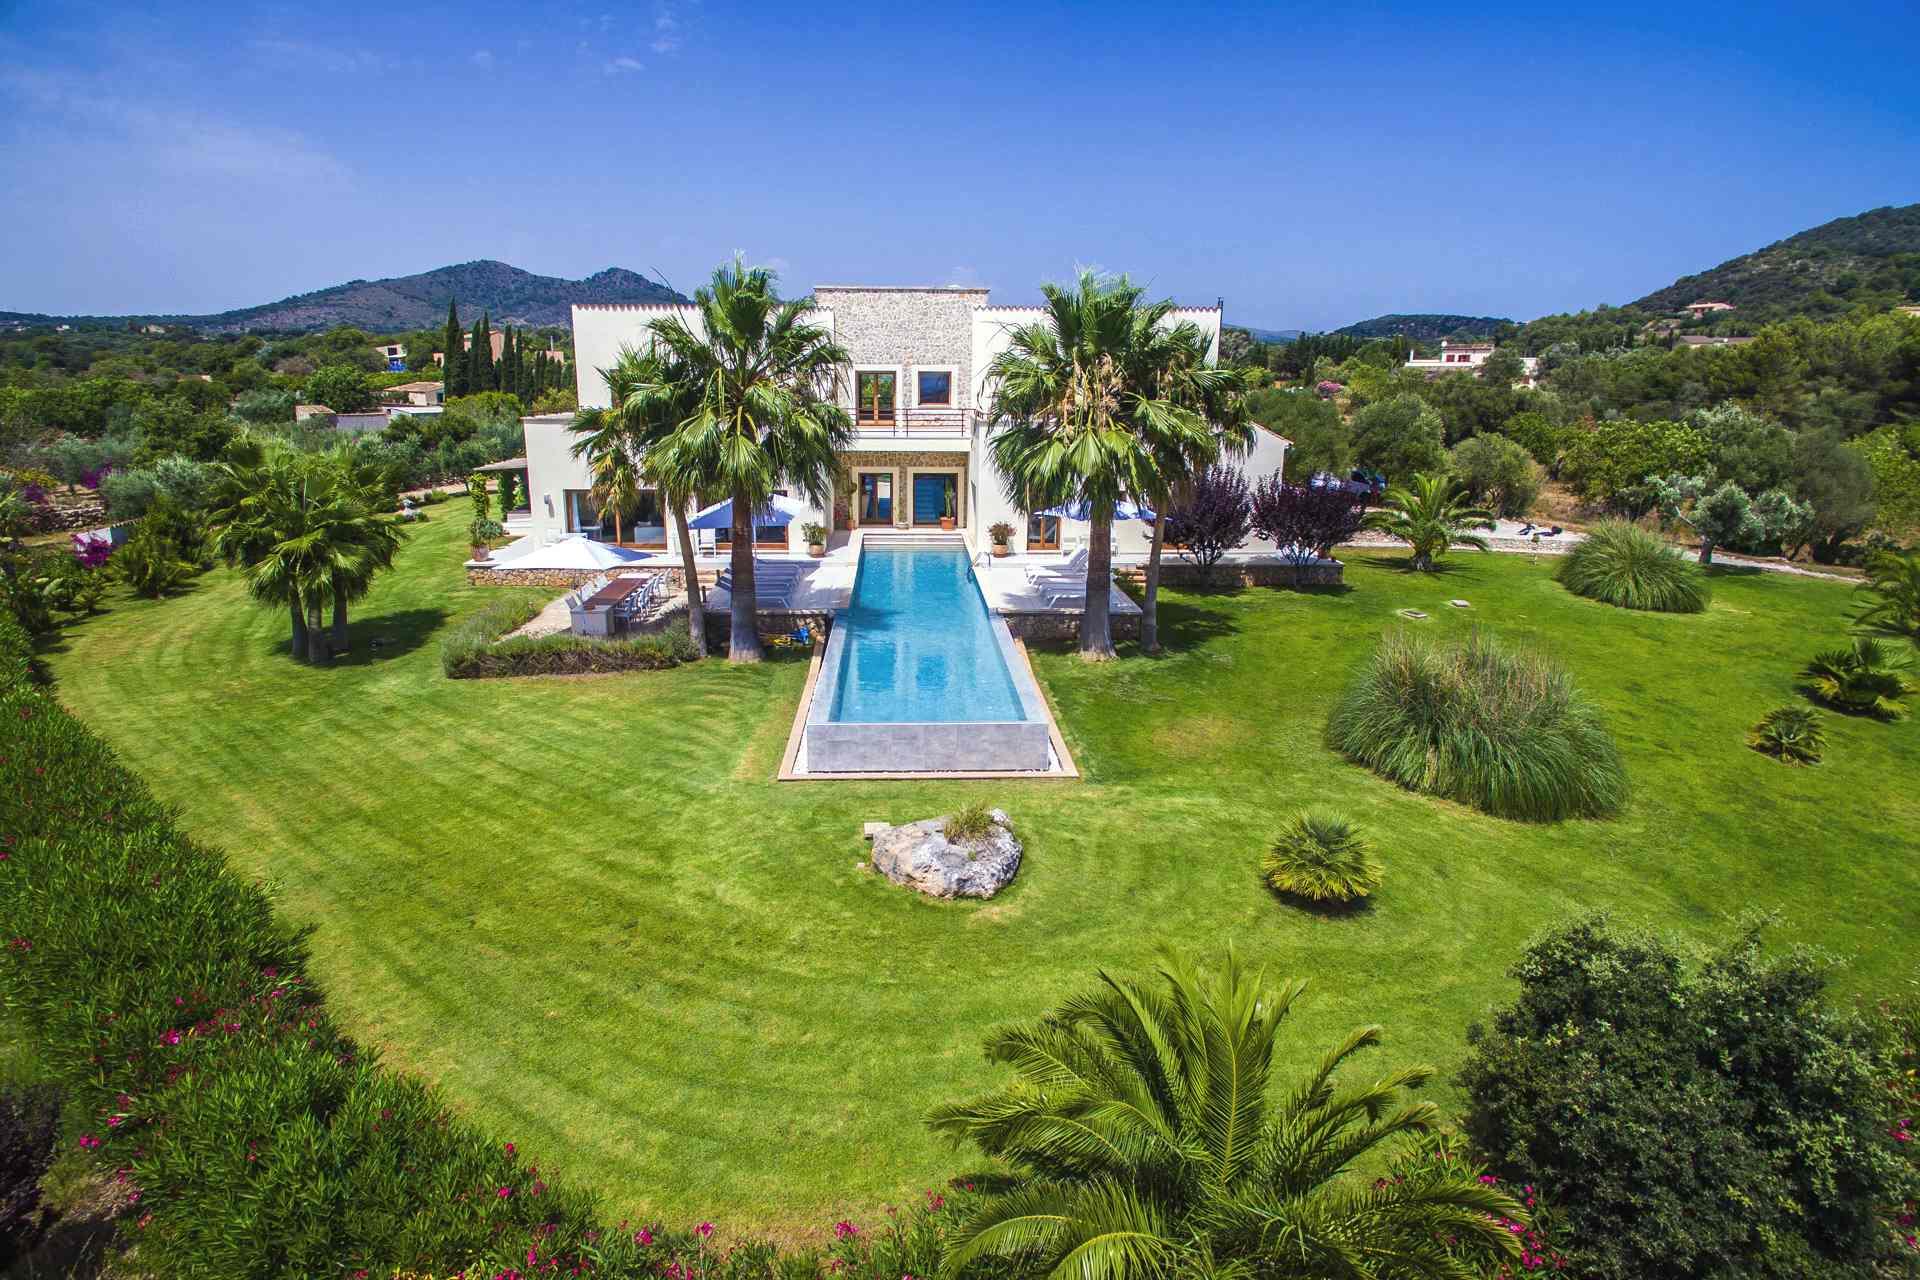 01-28 Luxus Finca Mallorca Nordosten Bild 1